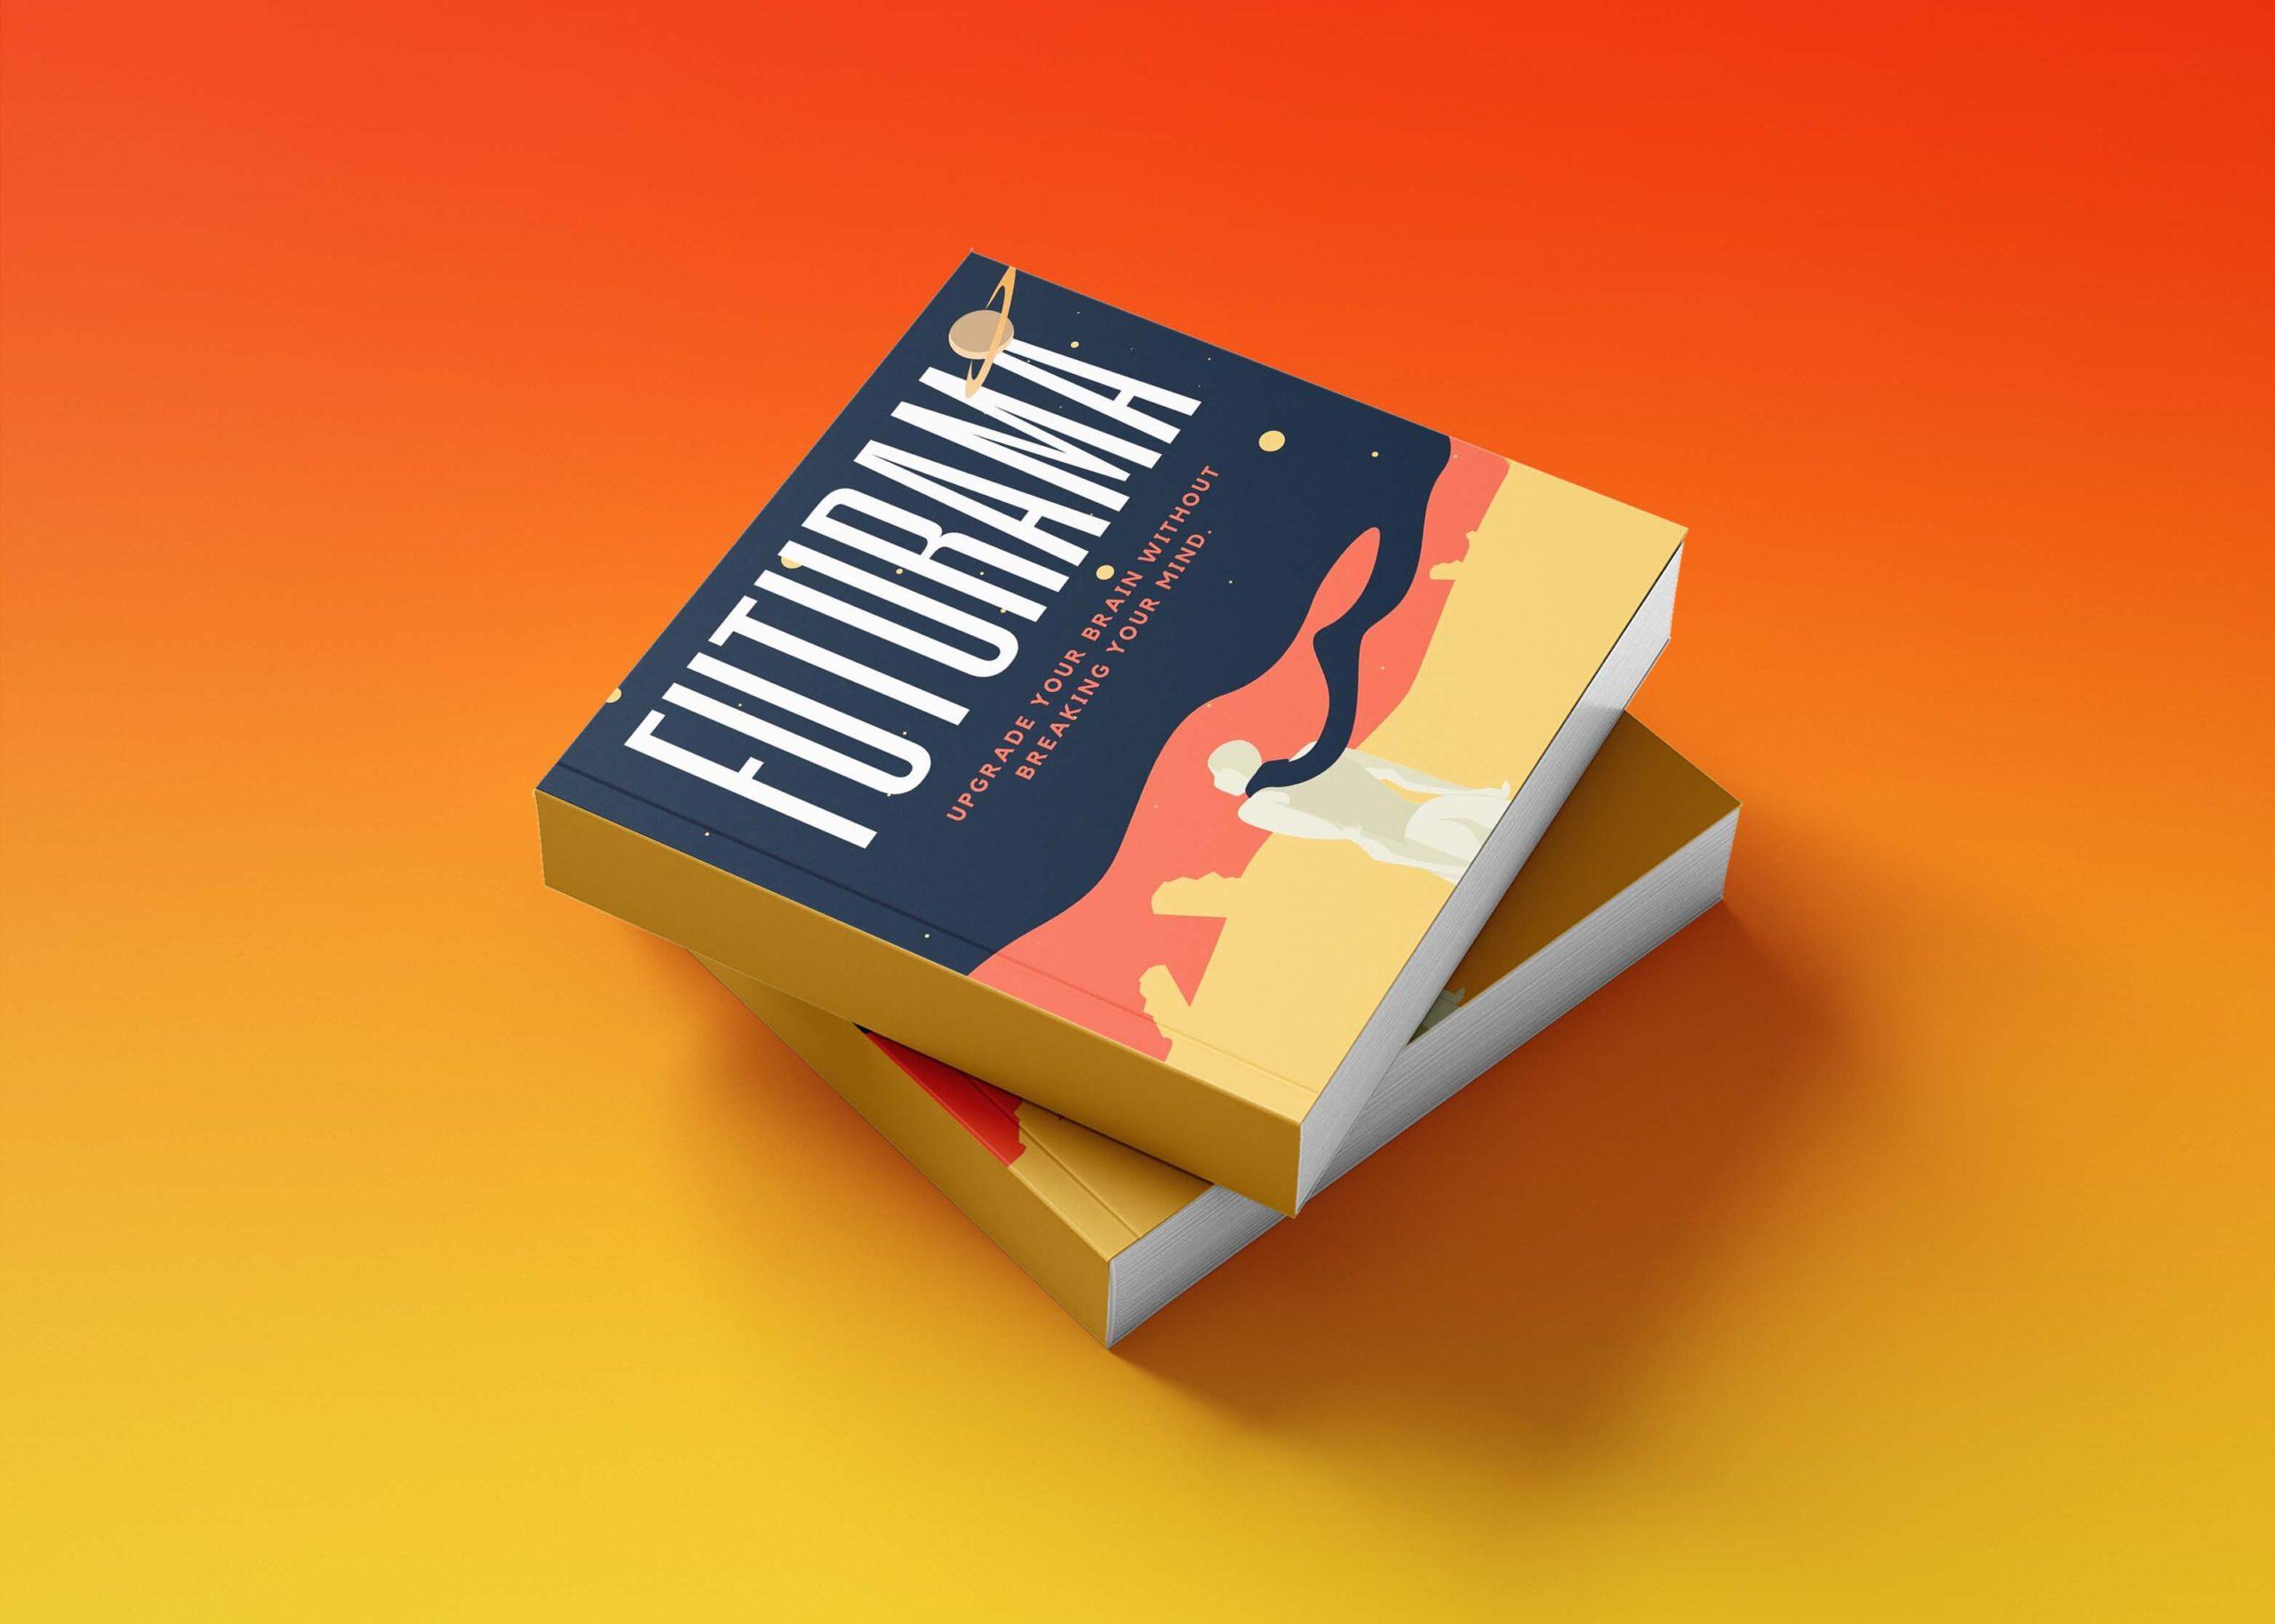 Freebies Prime Book Cover Mockup